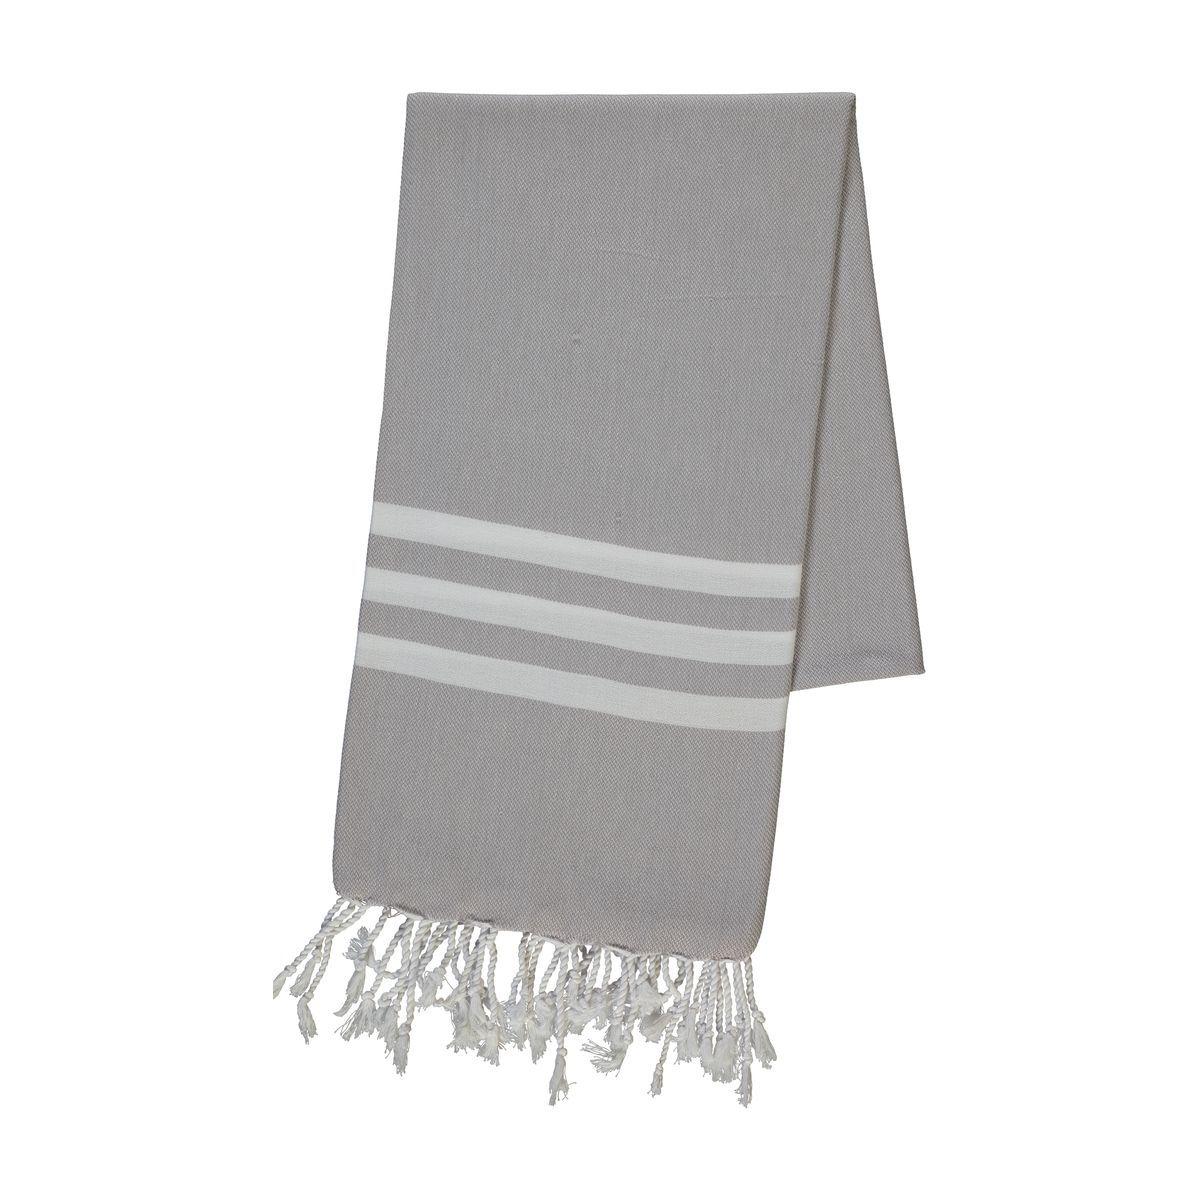 Peshtemal Bala Sultan - Light Grey